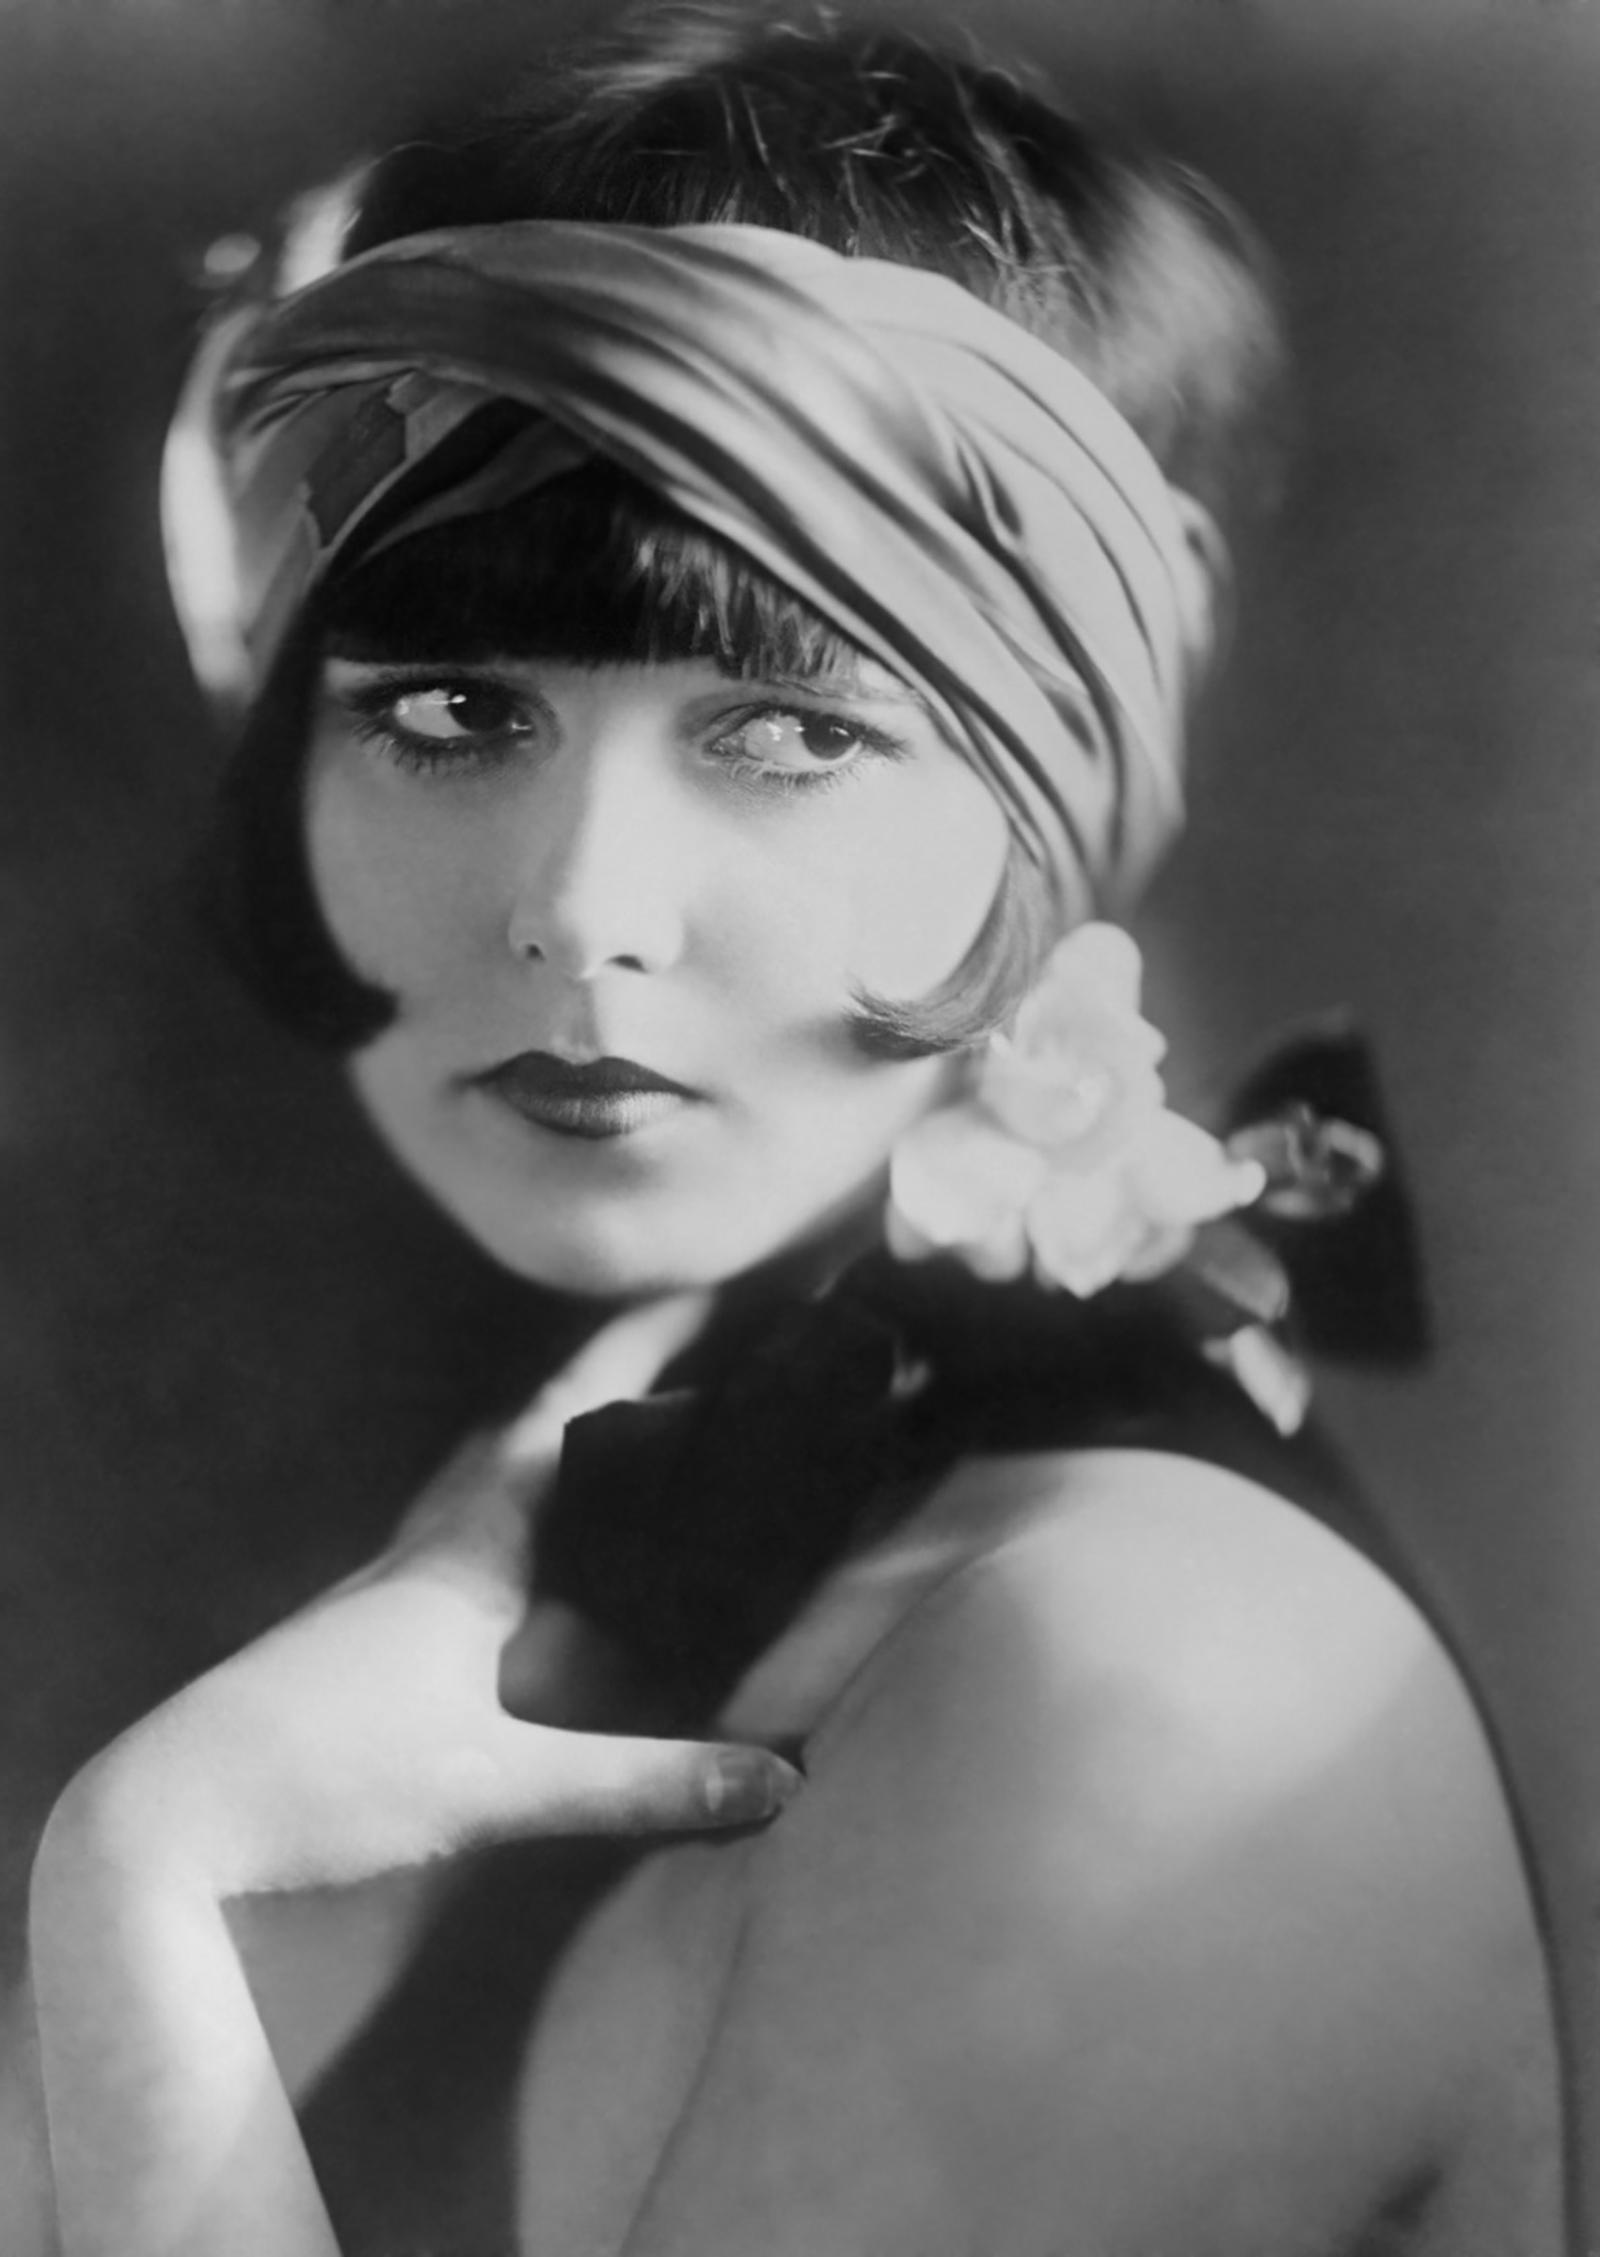 1925 Portrait of Actress Louise Brooks